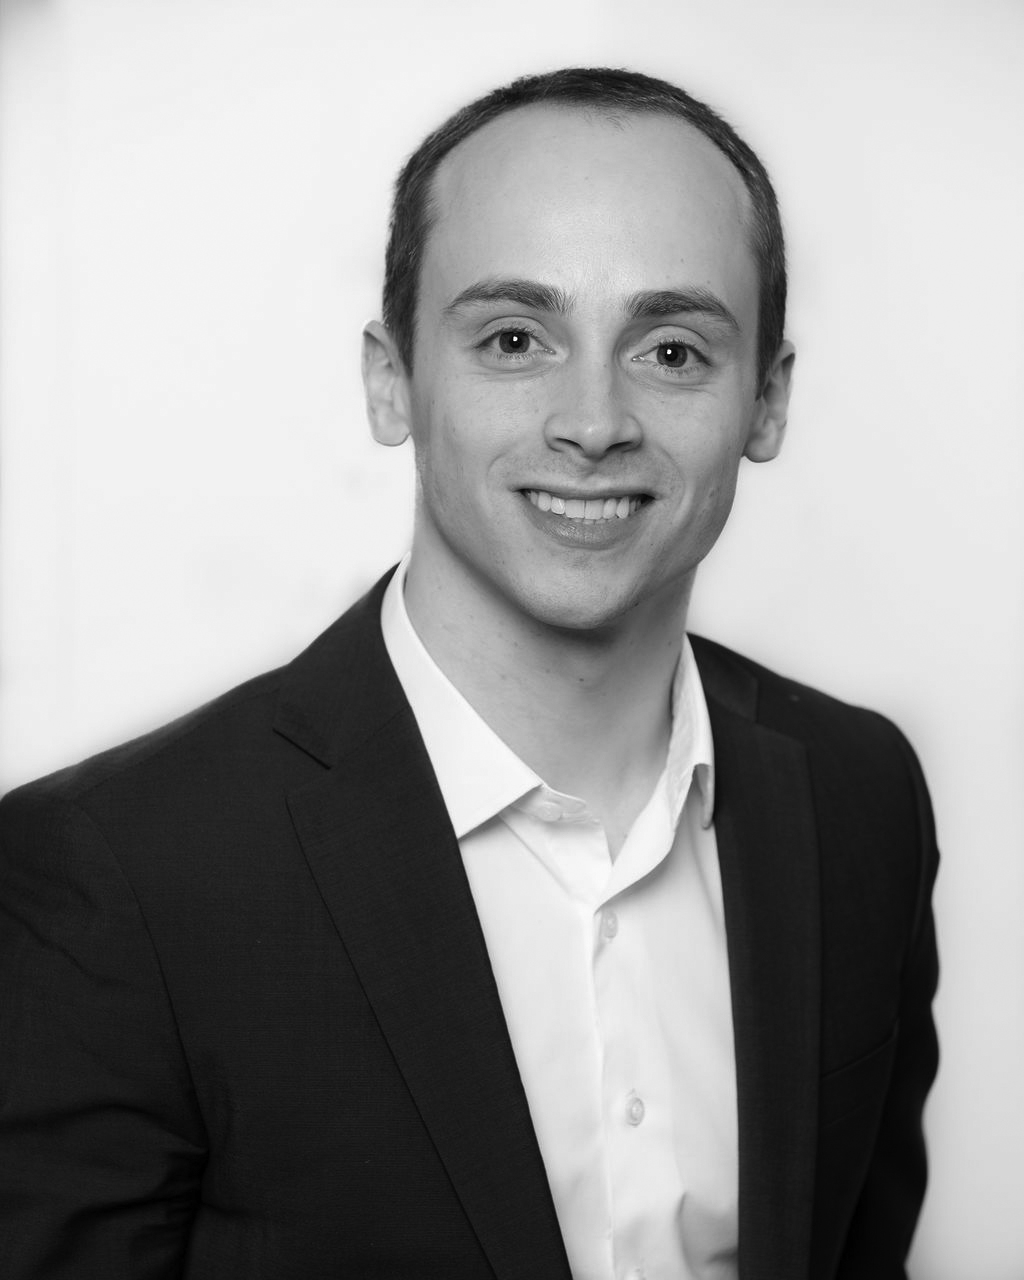 Blake Bracalenti - Vice President